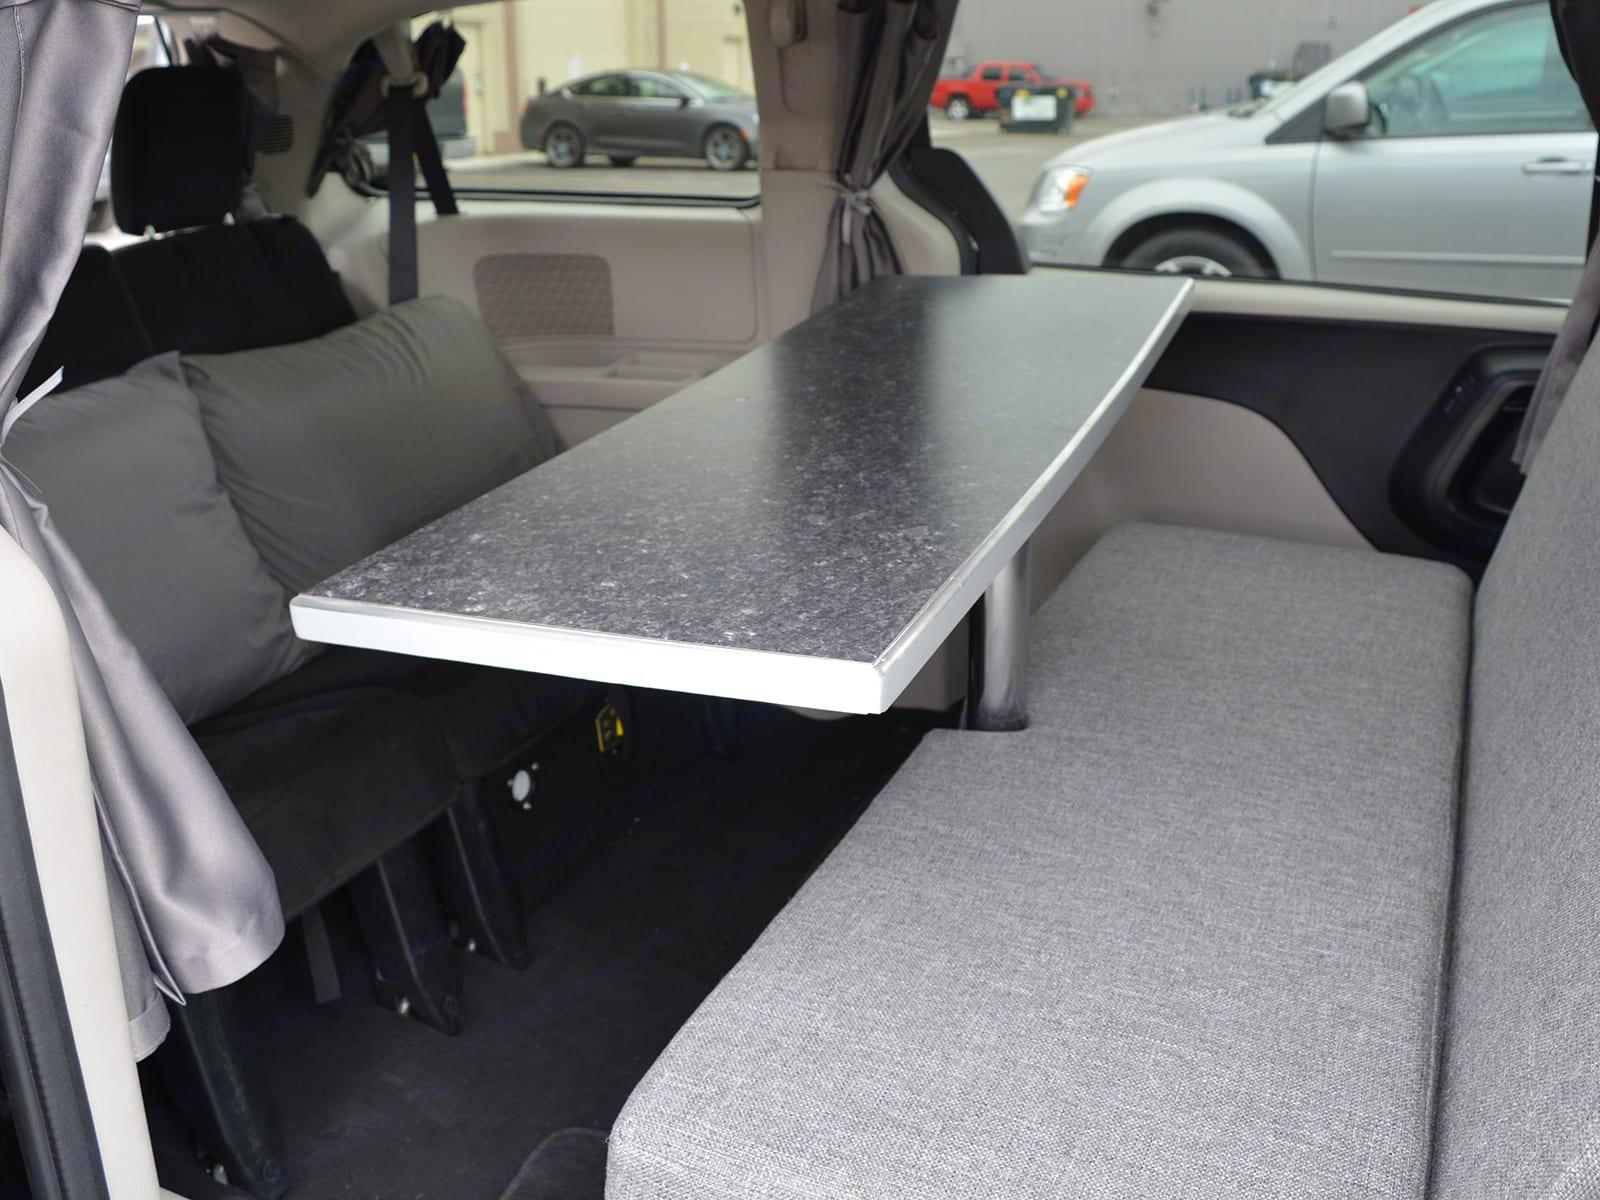 Get Lost Travel Van Interior Table. Dodge Grand Caravan 2016